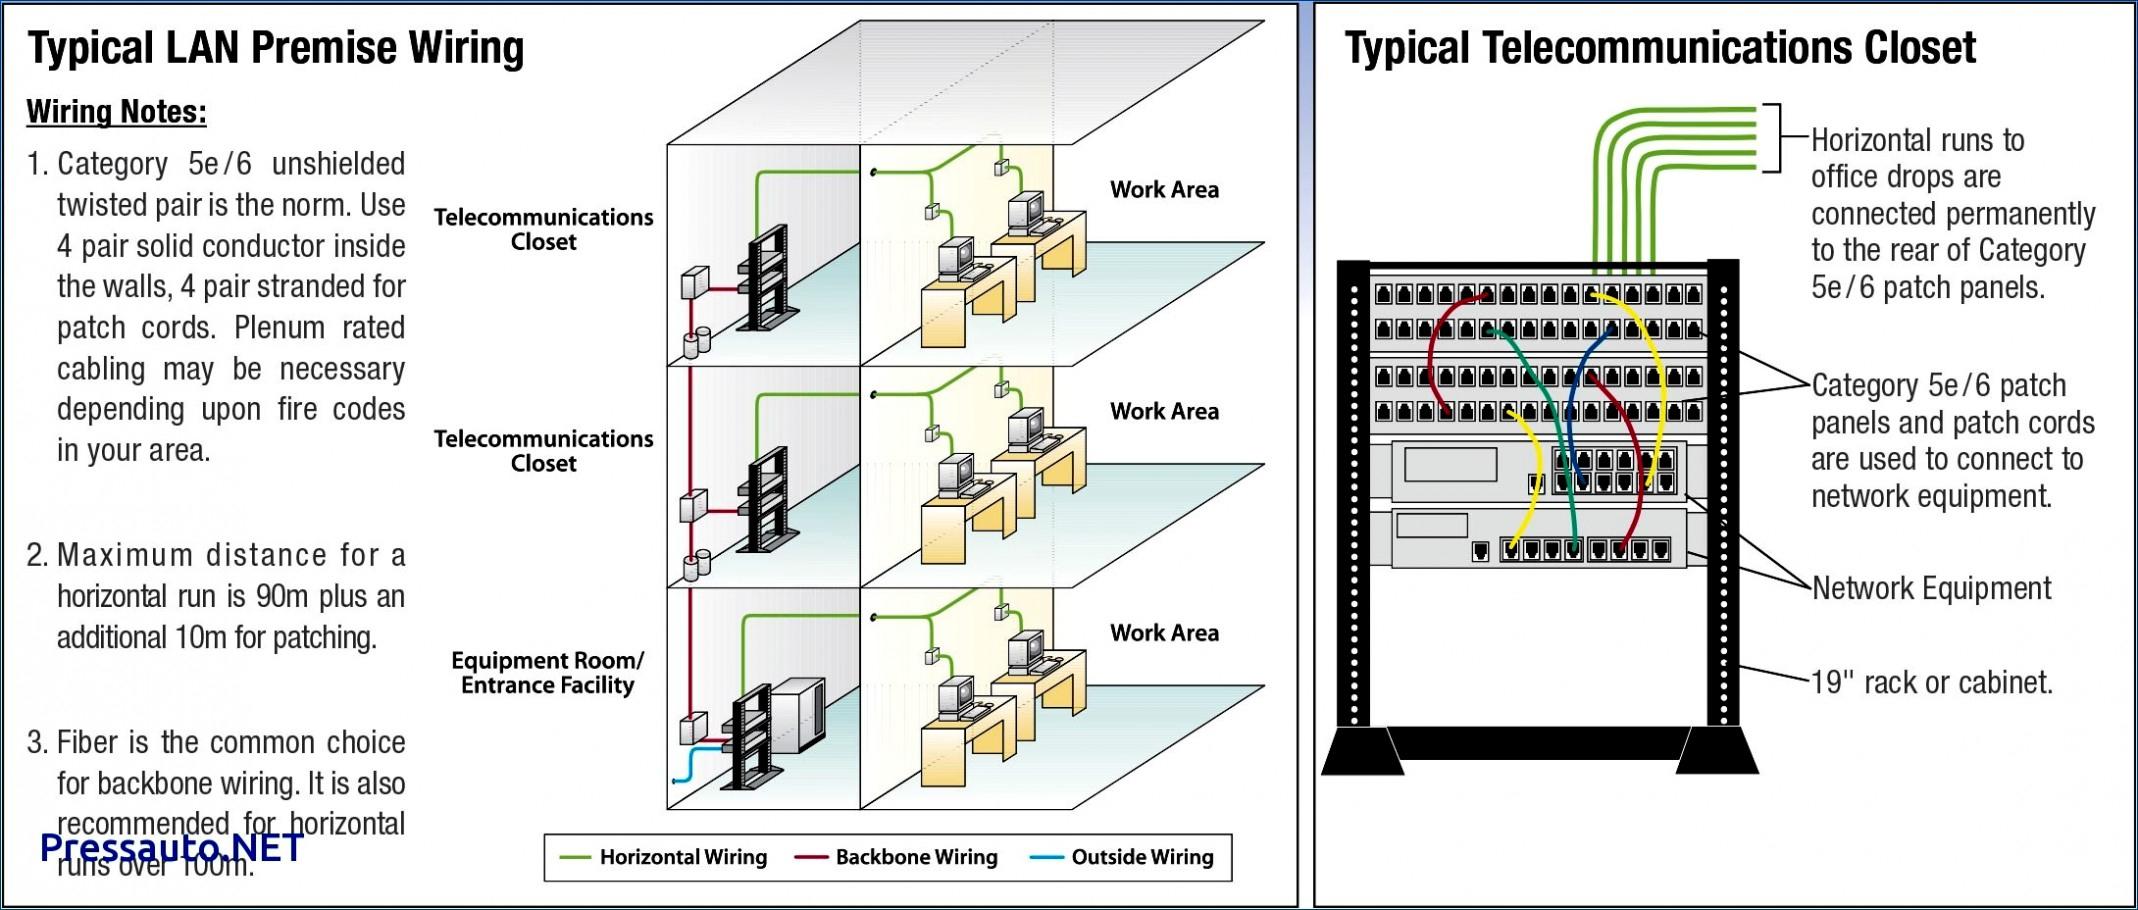 Fios Tv Wiring Diagram from 2020cadillac.com